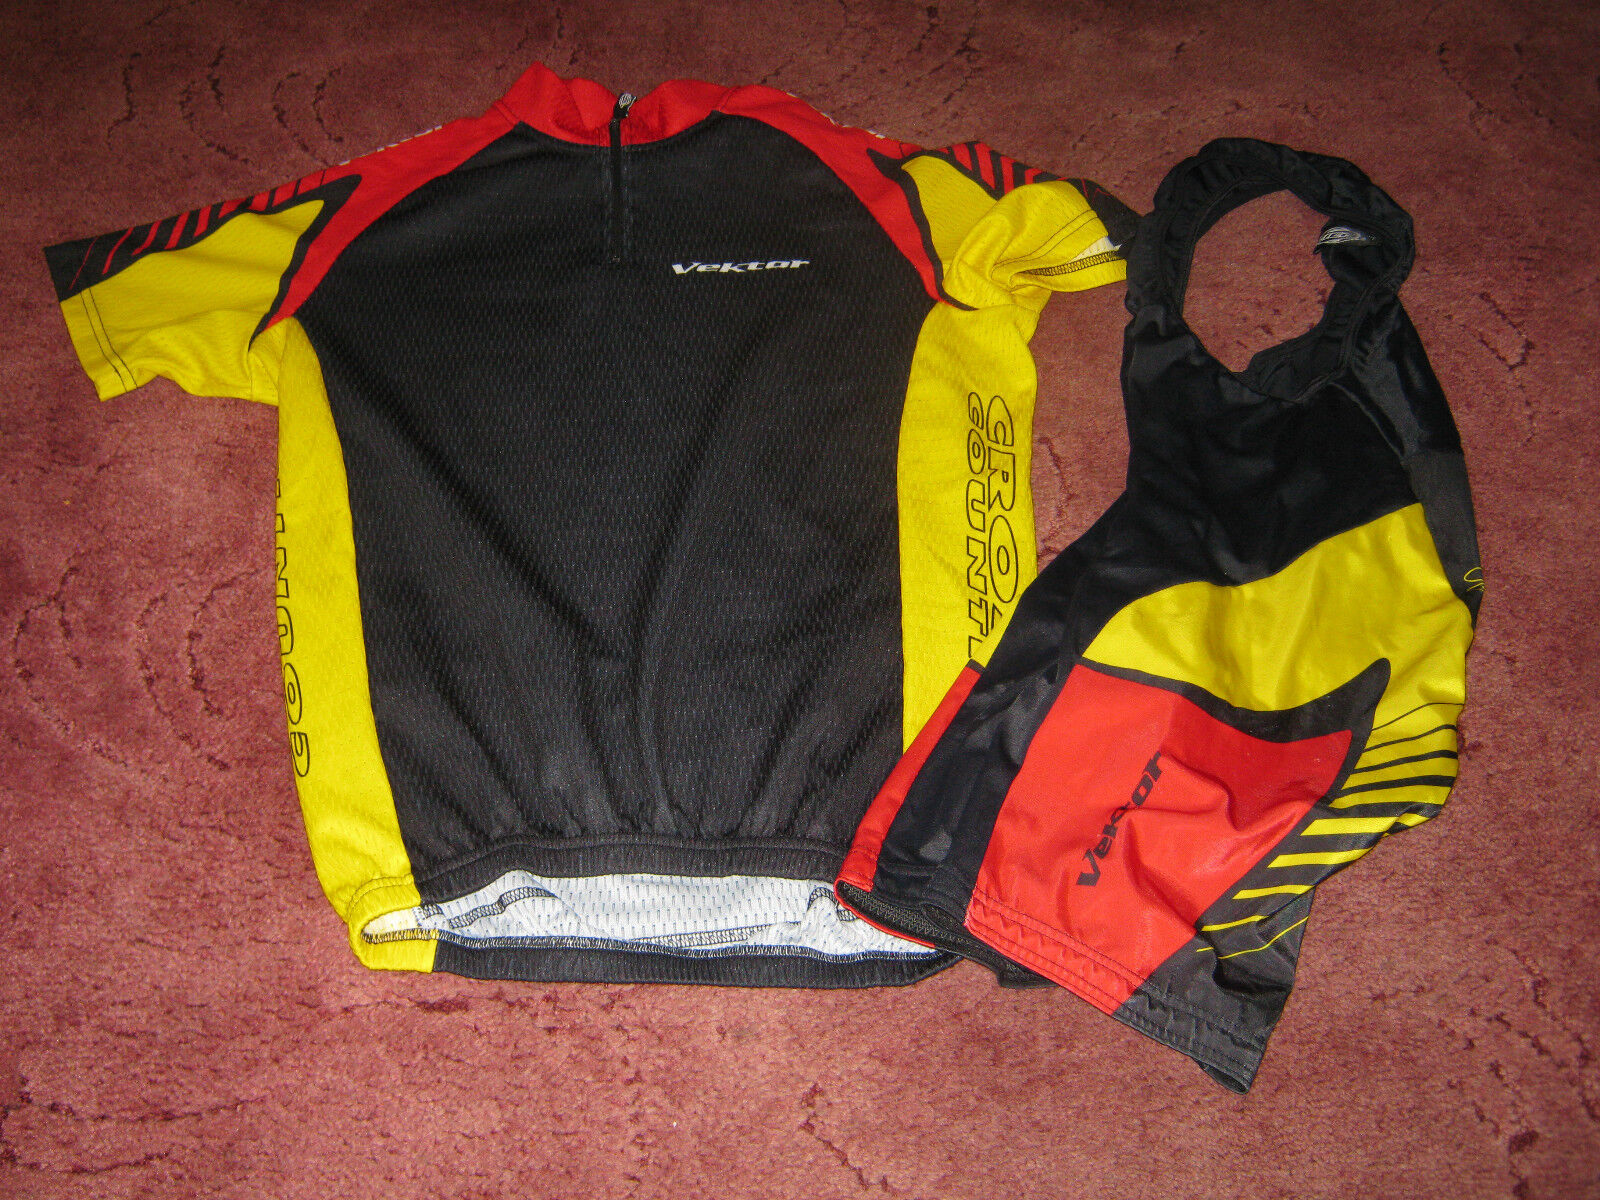 CIEGI VECTOR & Ciclismo in jersey ITALIAN Bib Shorts [M]